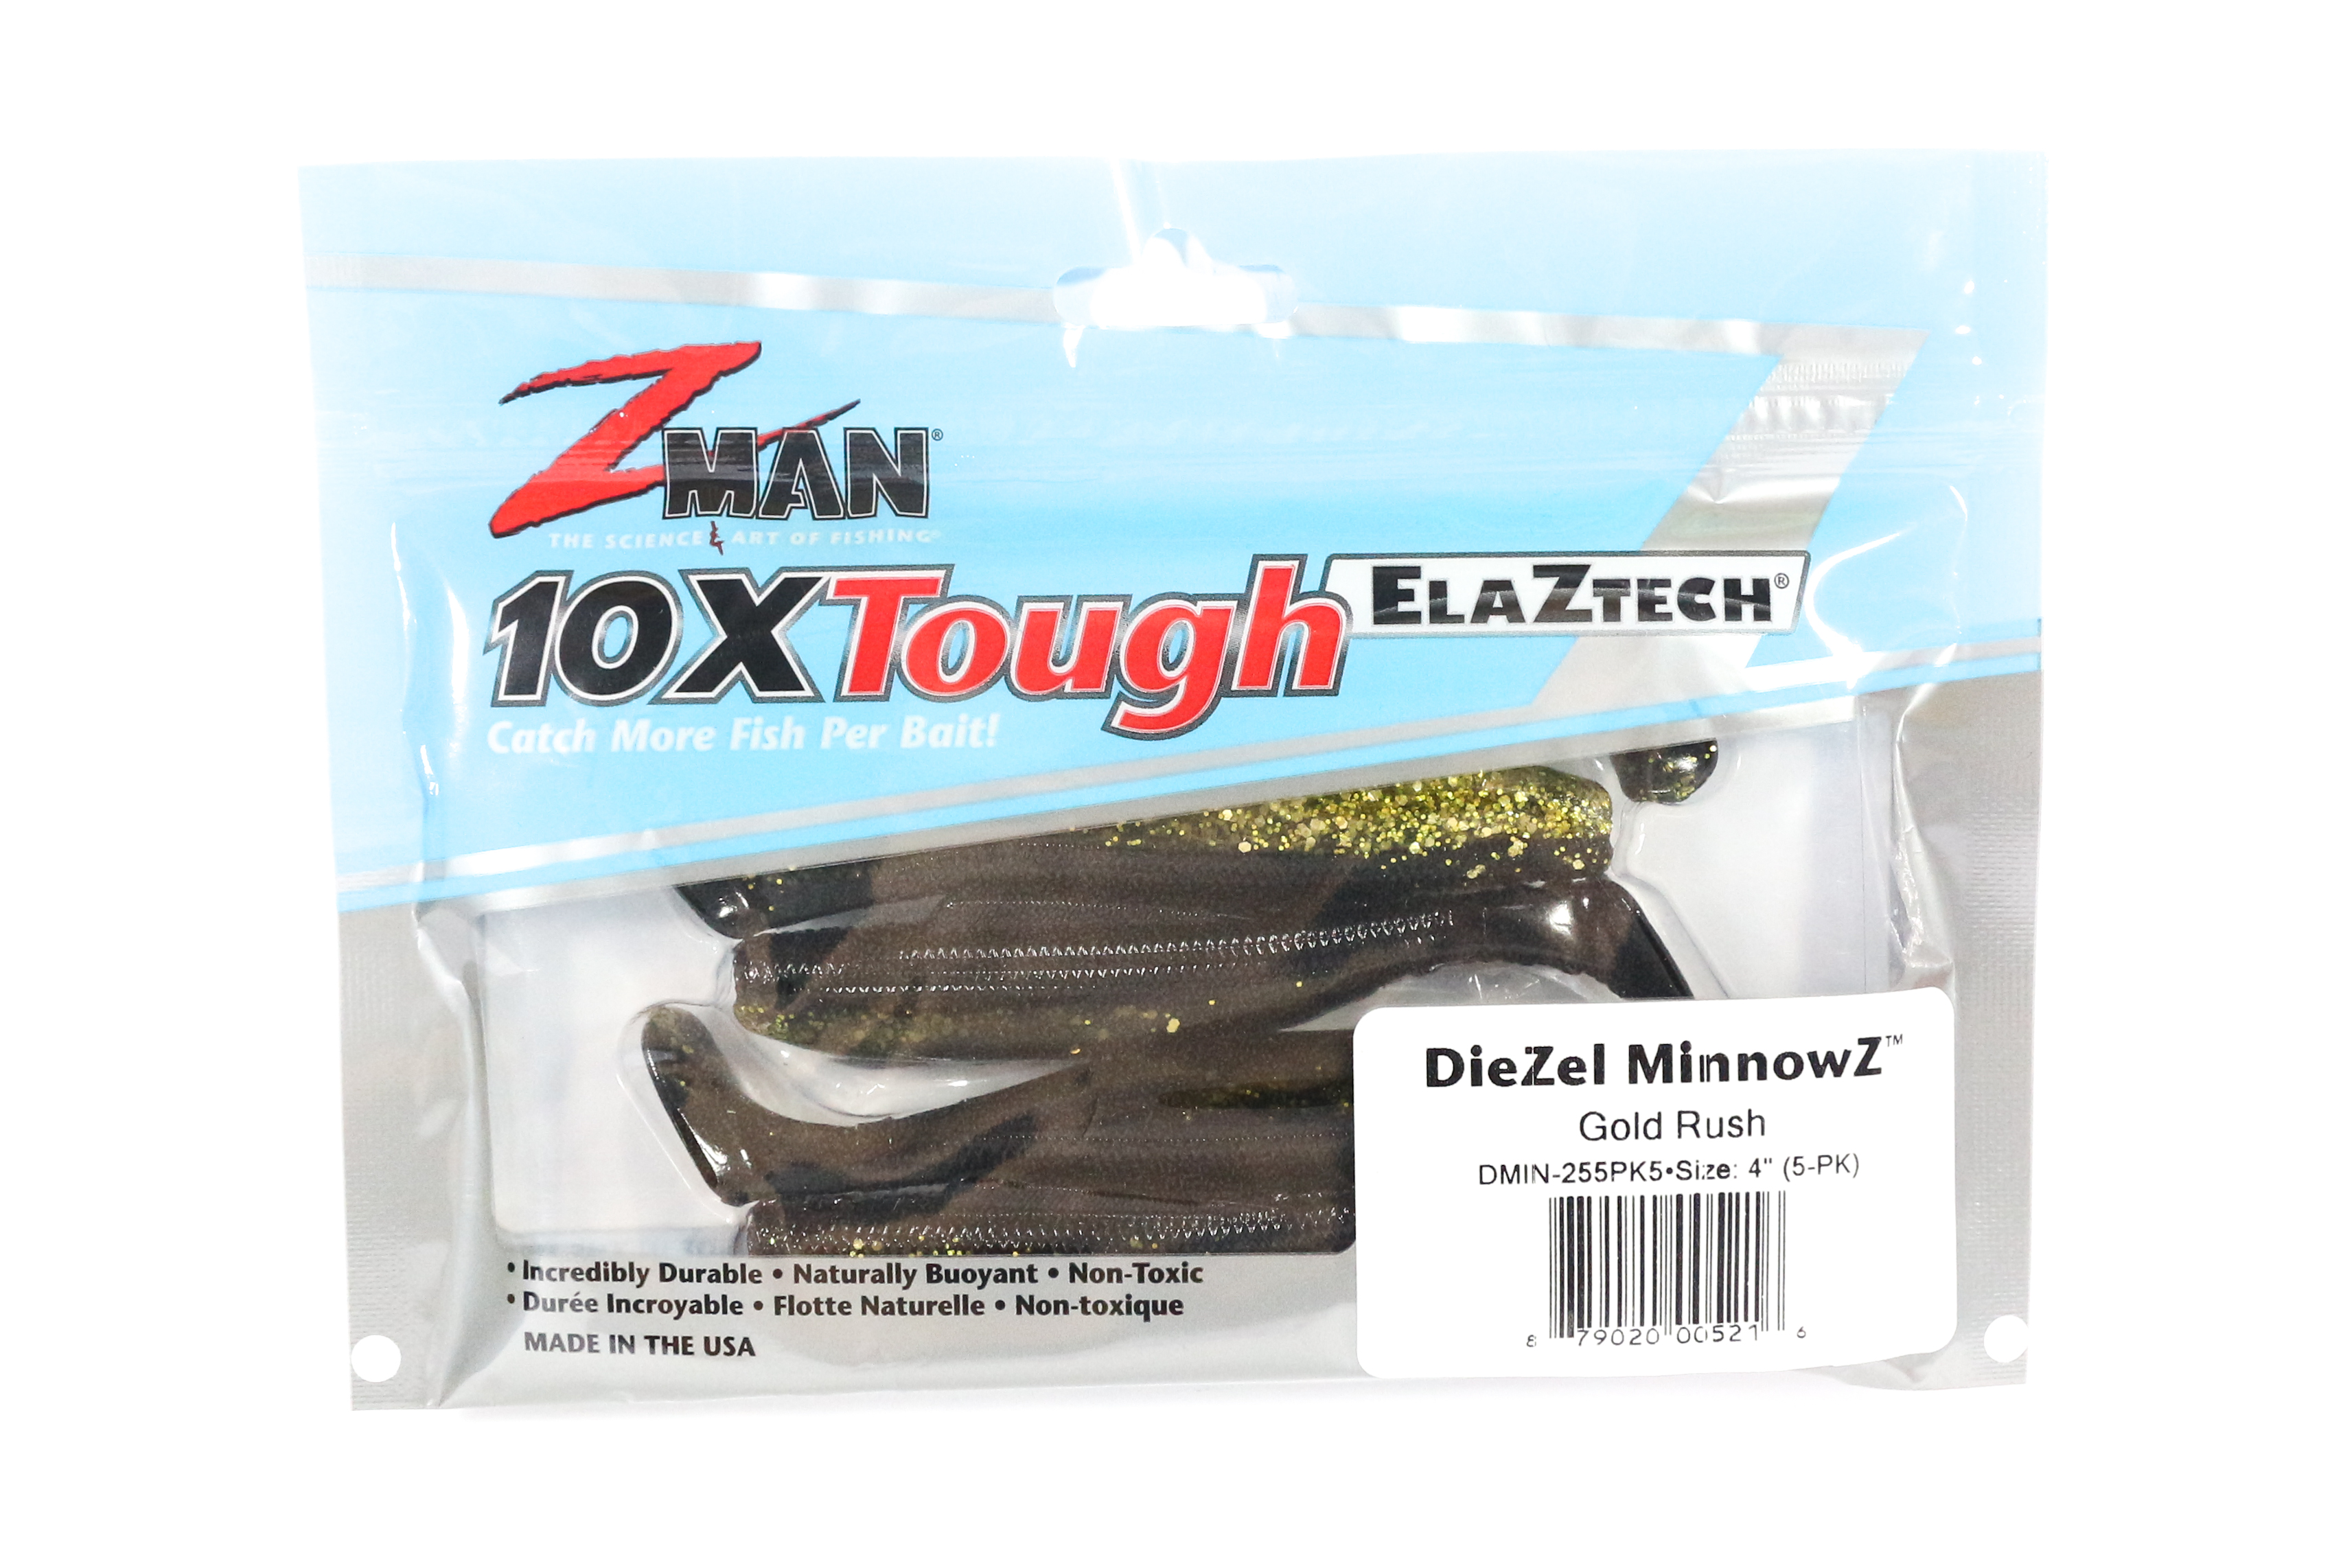 Zman Soft Lure Diezel MinnowZ 4 Inch 5 per pack Gold Rush (5216)